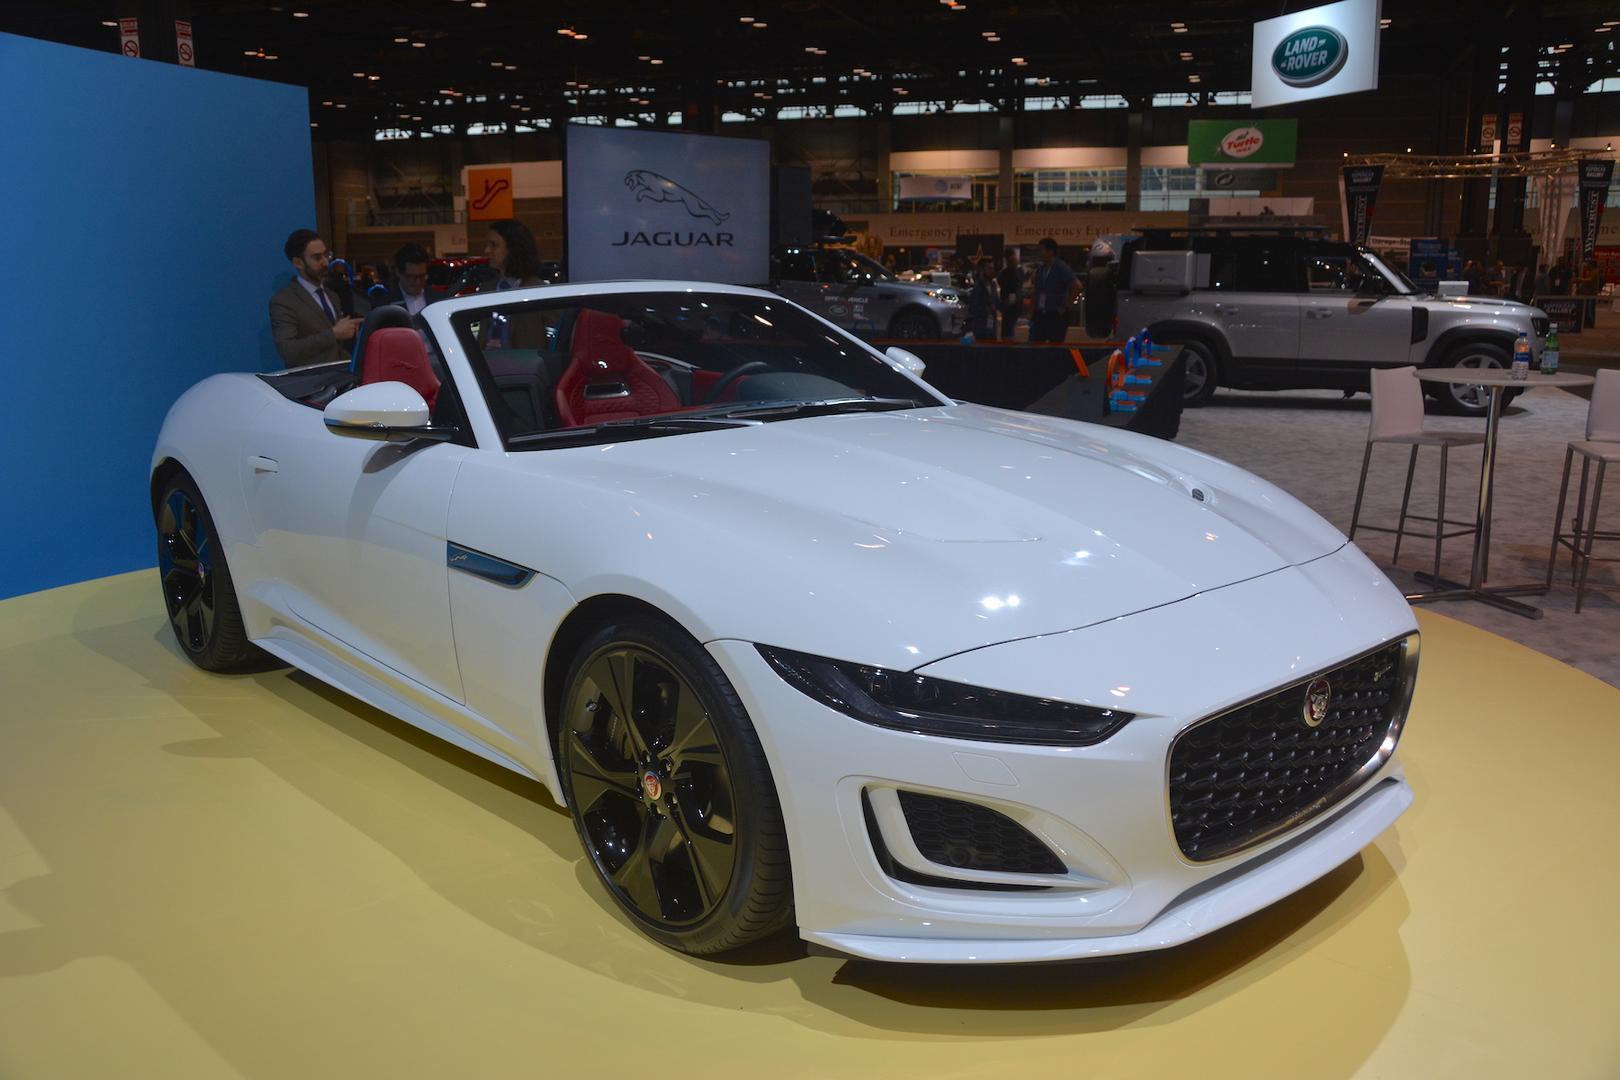 2020 Jaguar F-Type Convertible Price